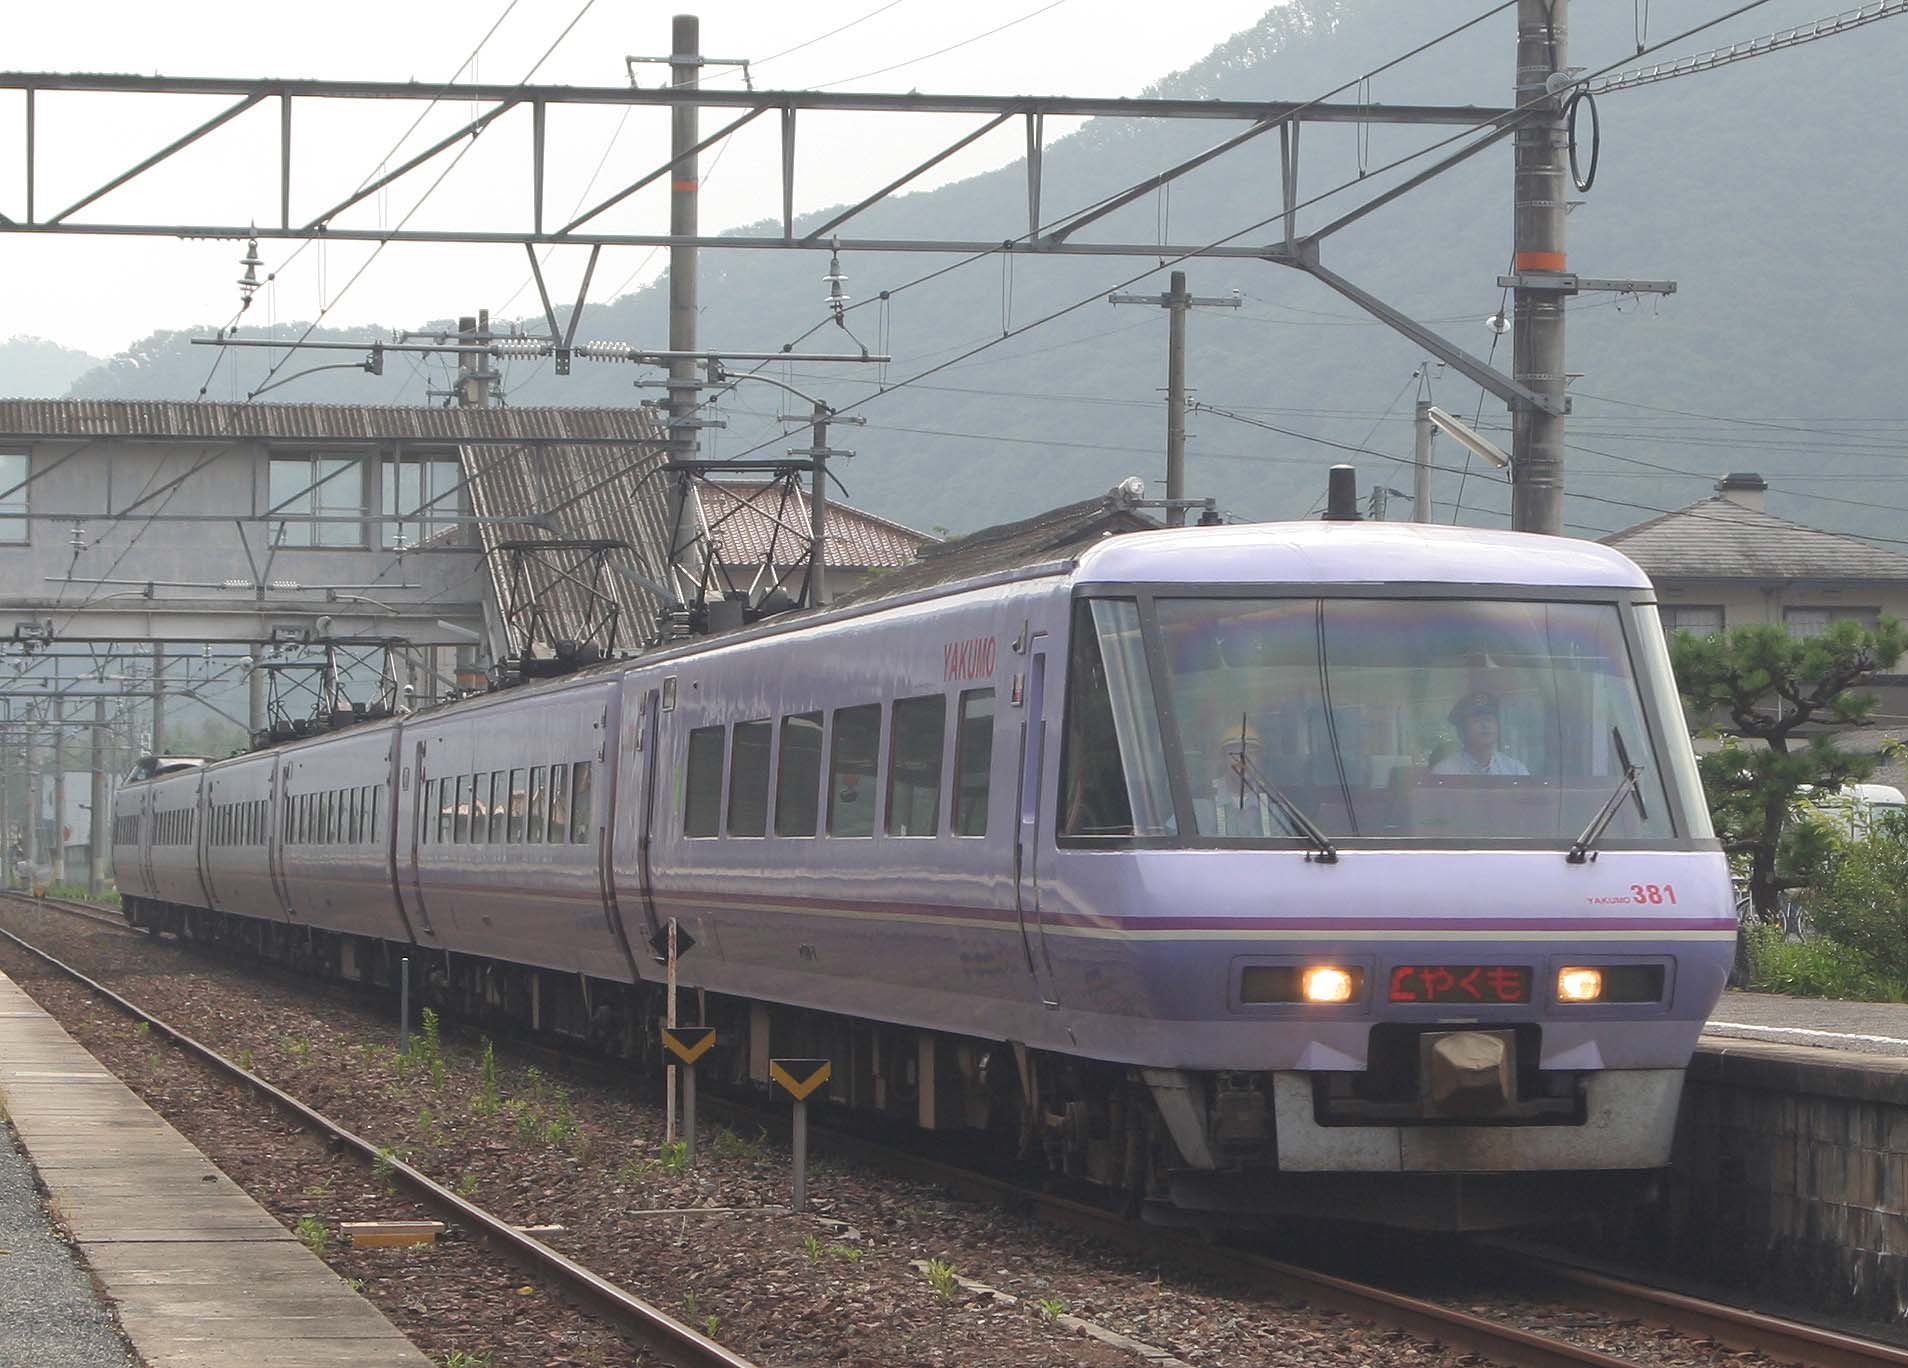 JRW kuro380 parorama - 元日・JR西日本乗り放題きっぷ2019発売決定